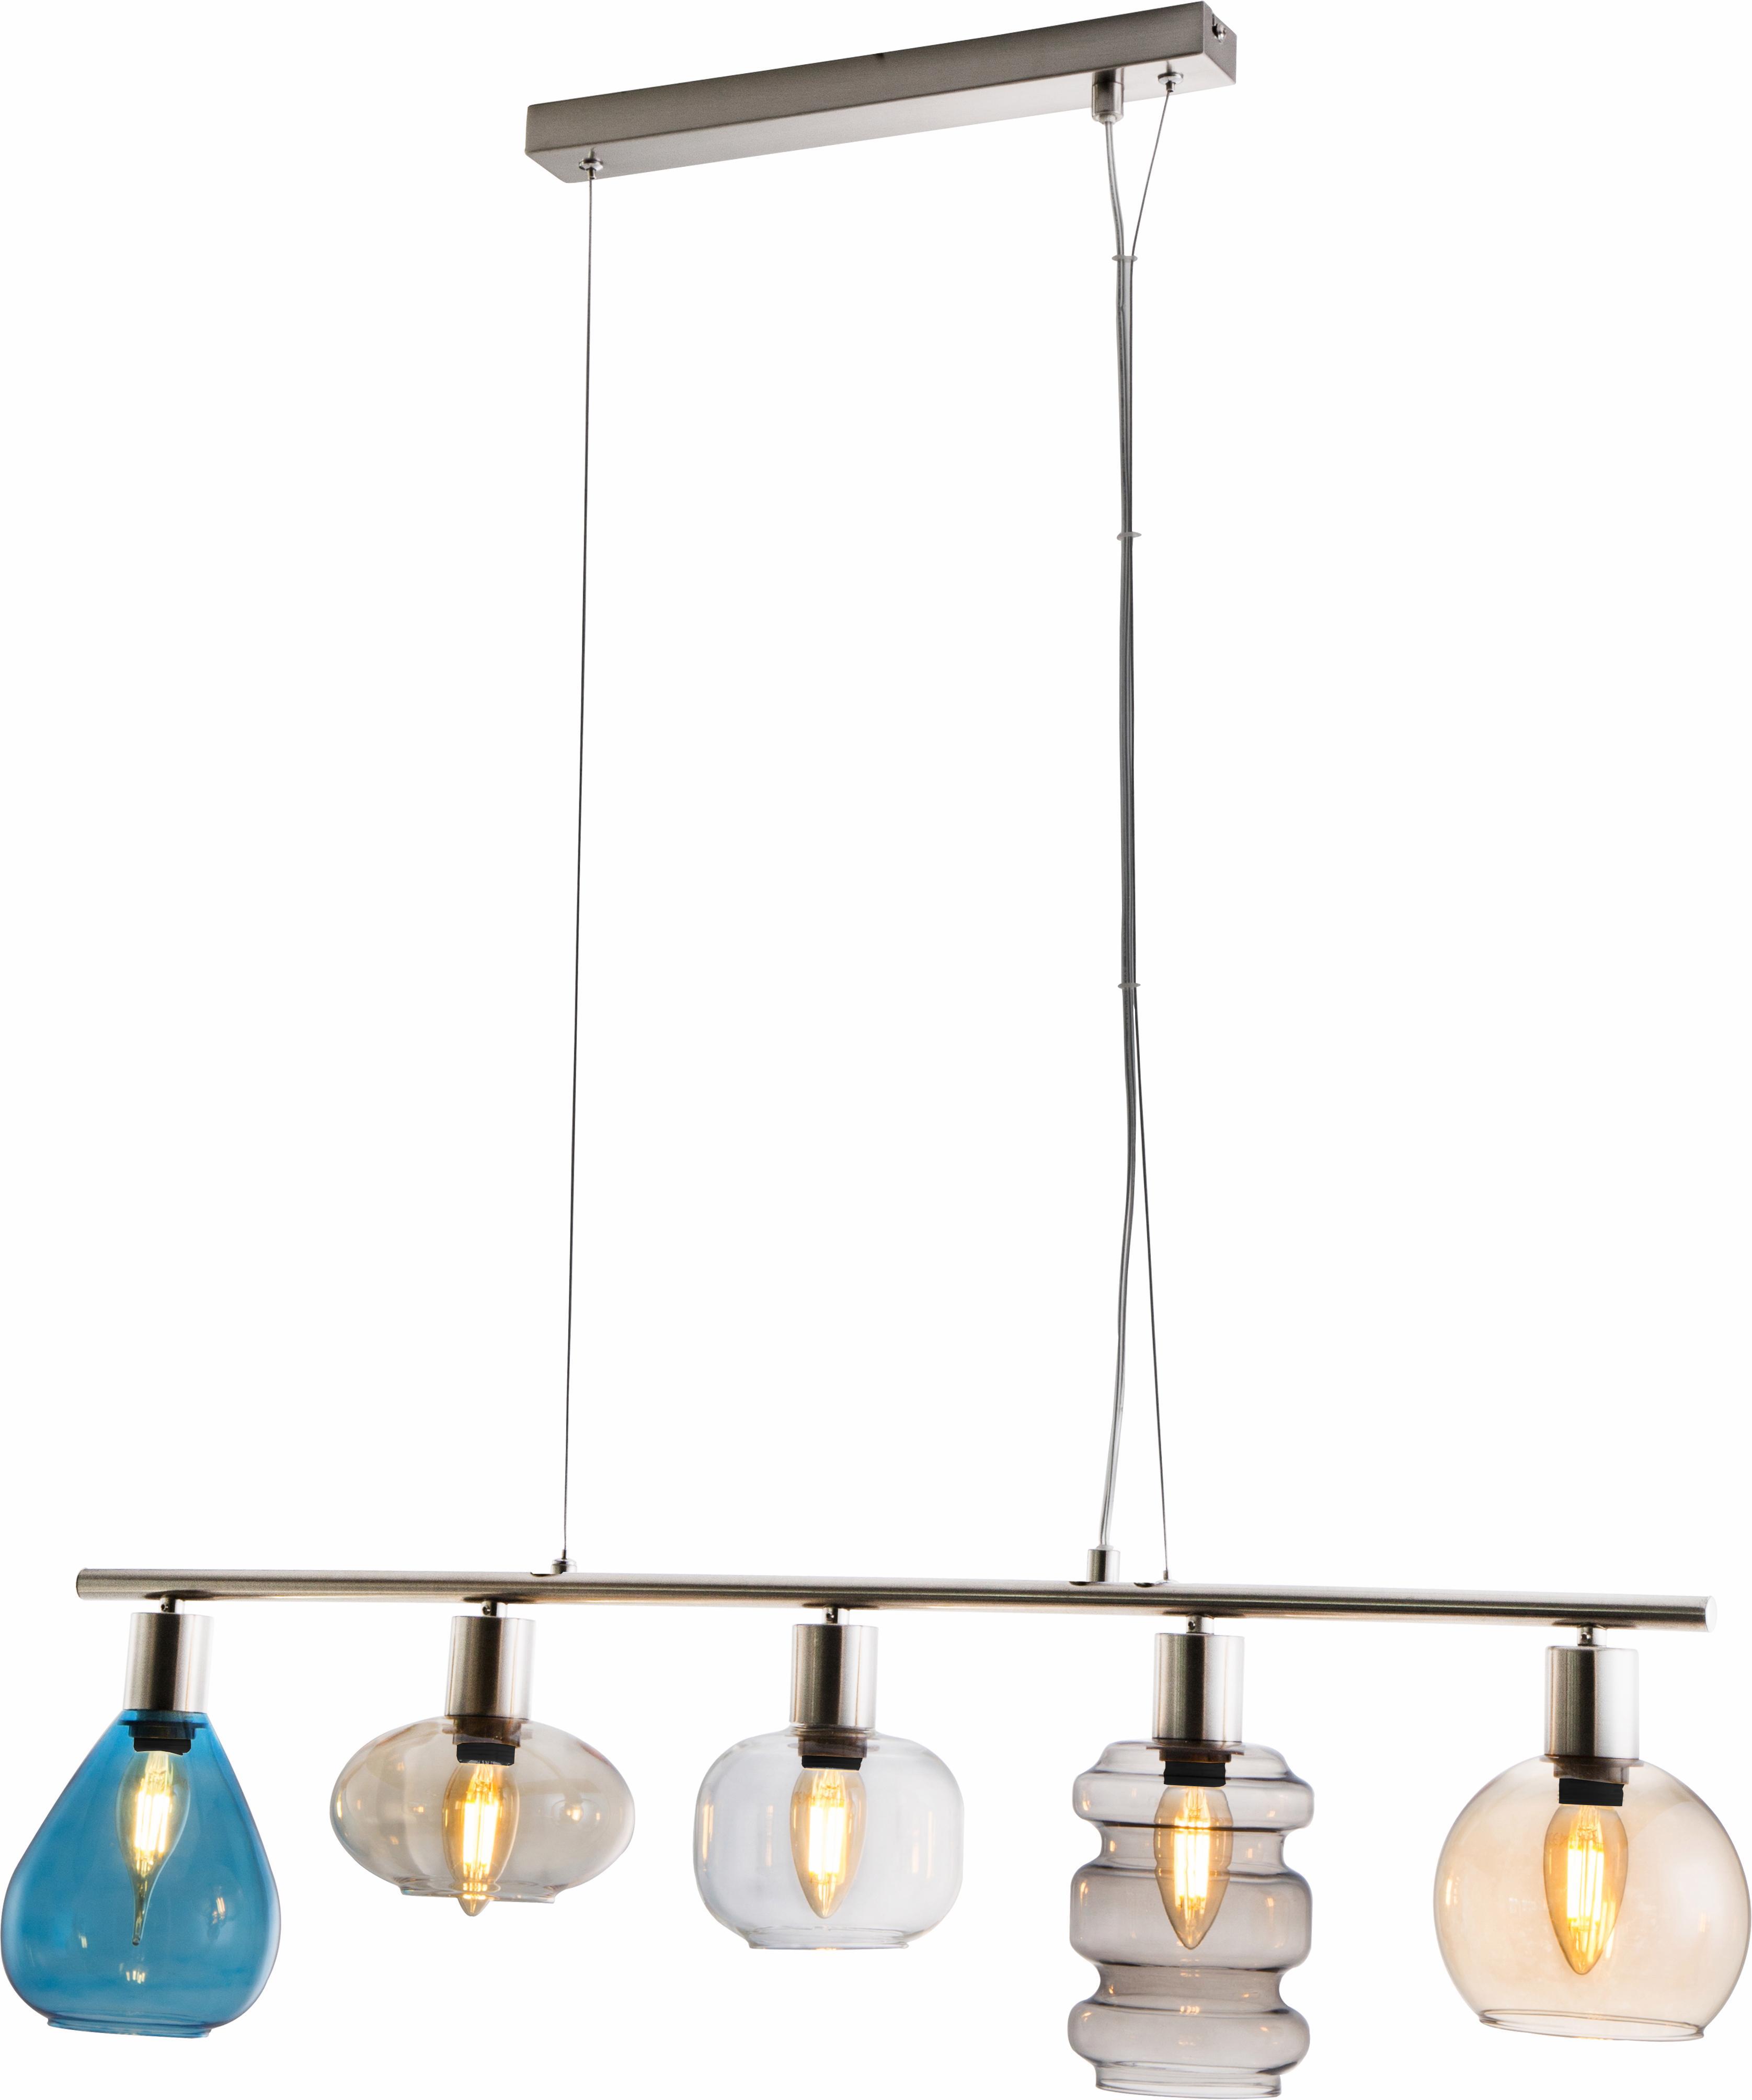 Nino Leuchten,Pendelleuchte PESARO